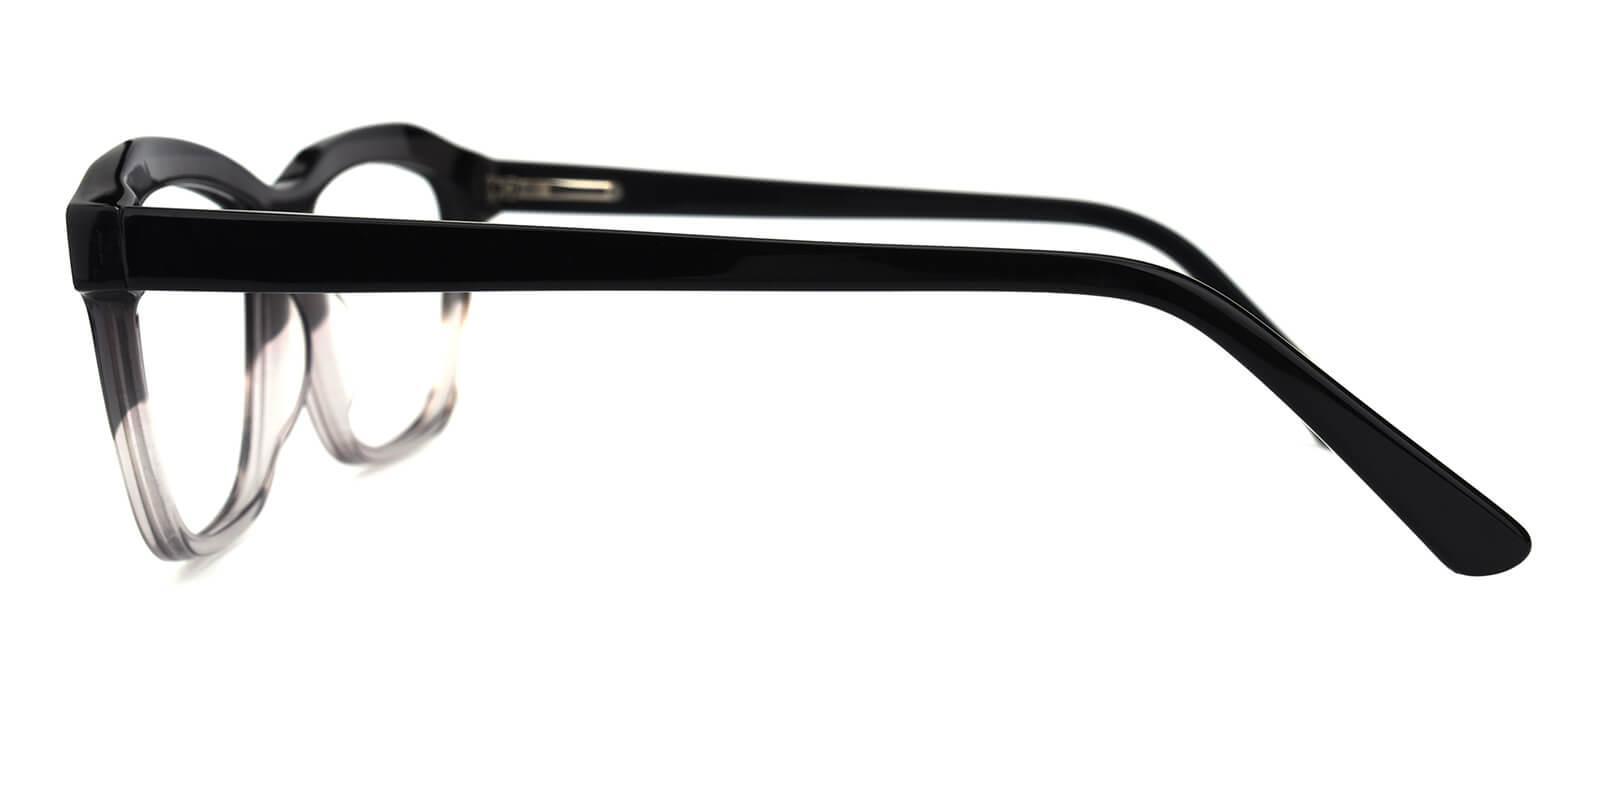 Gate-Translucent-Cat / Geometric-Acetate-Eyeglasses-detail